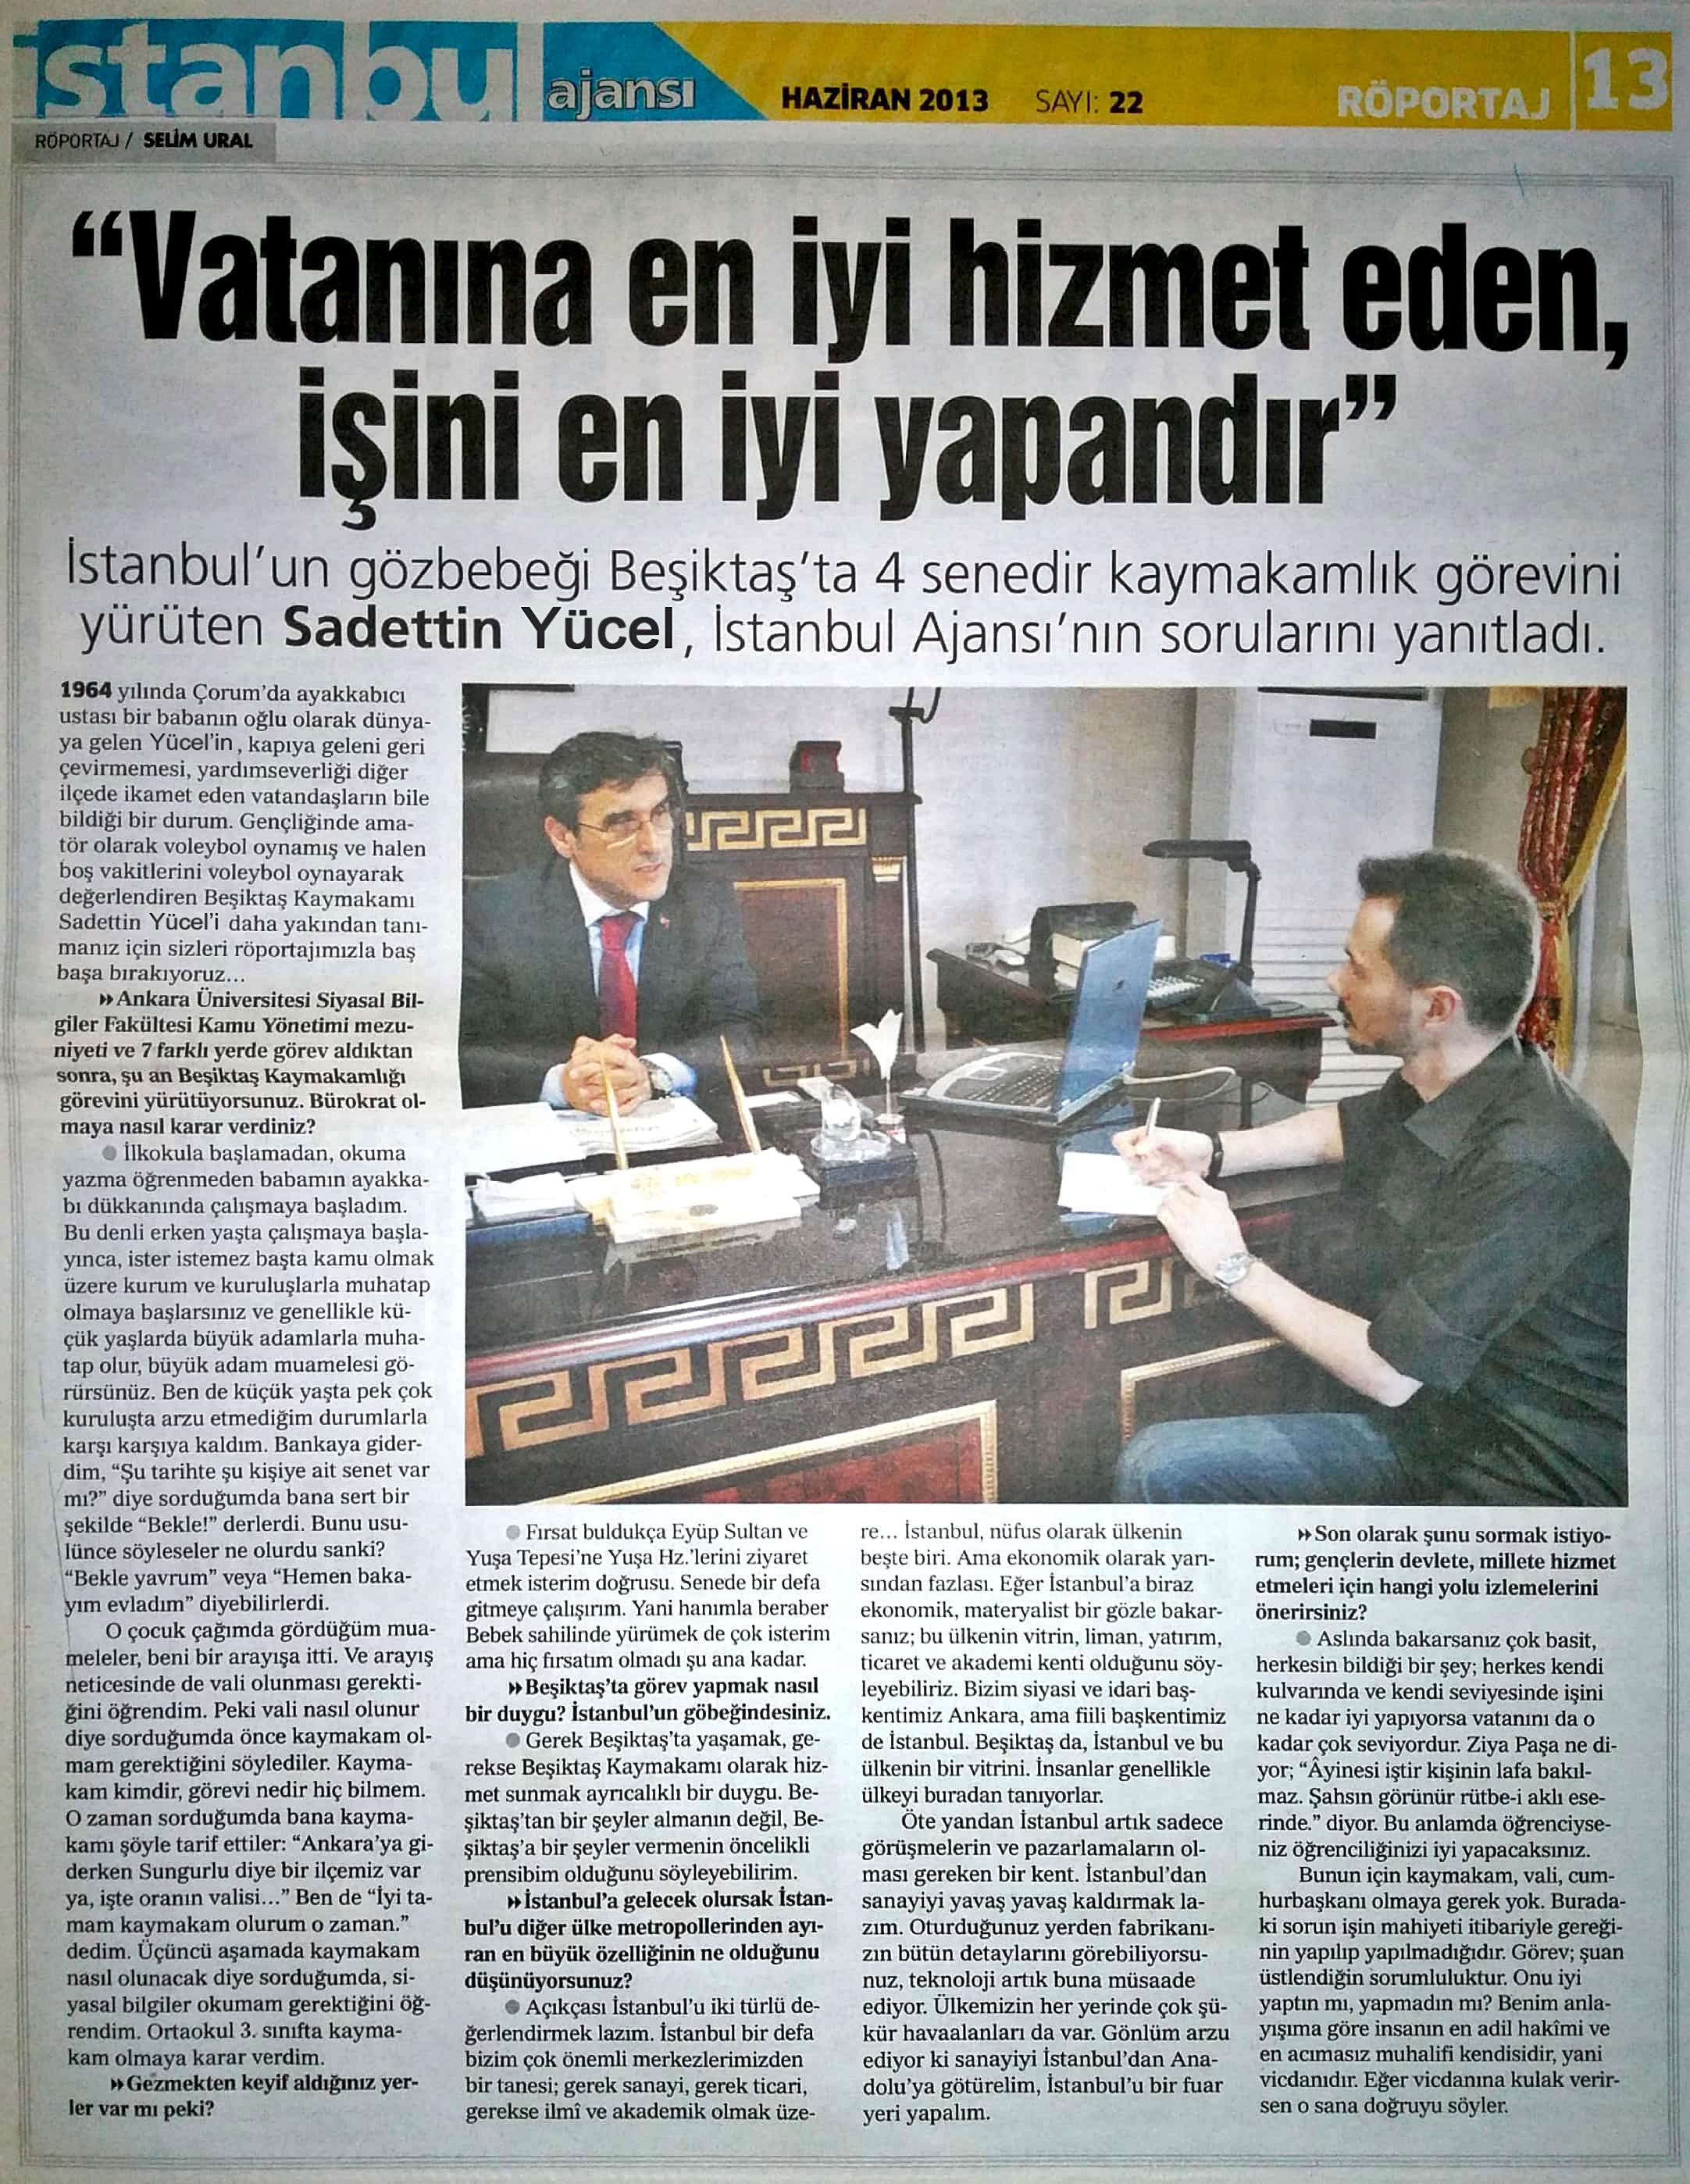 Beşiktaş Kaymakamı Saadettin Yücel